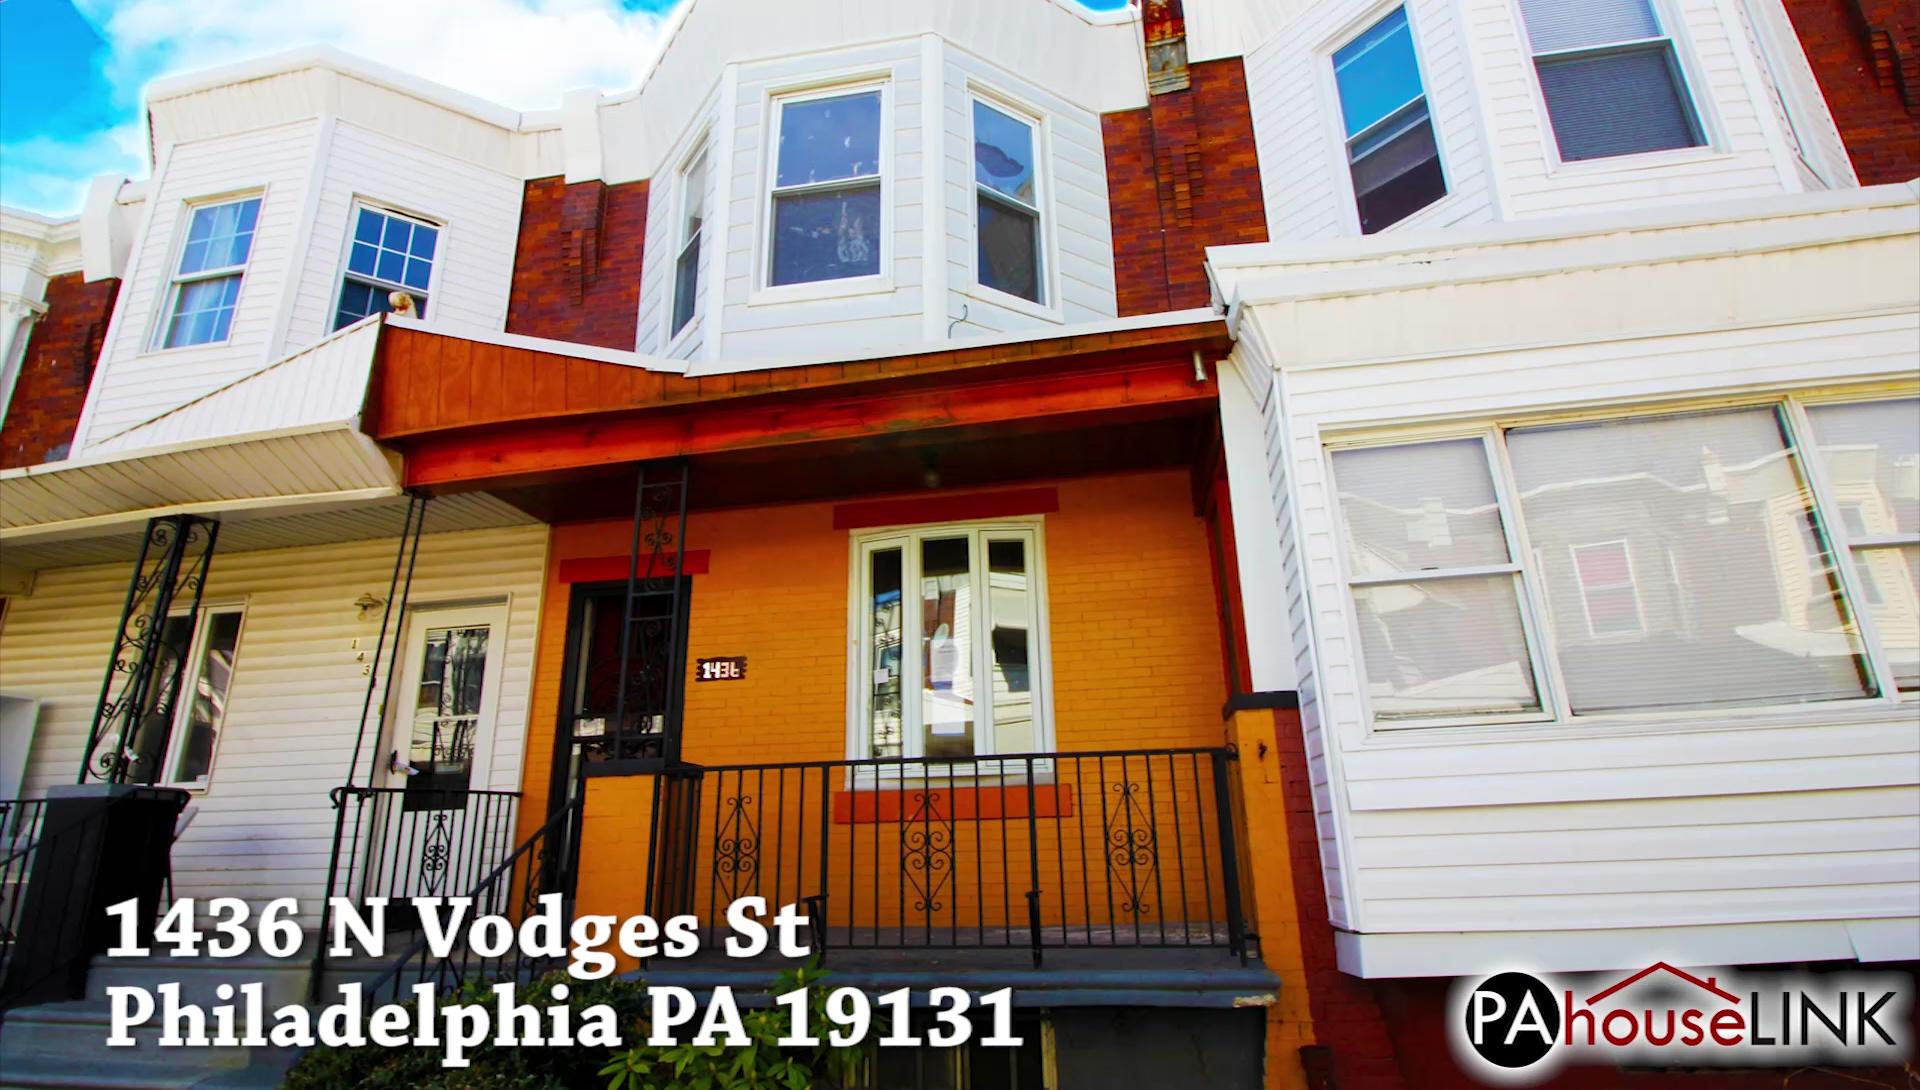 1436 N Vodges St Philadelphia PA 19131 | Foreclosure Properties Philadelphia PA 19131